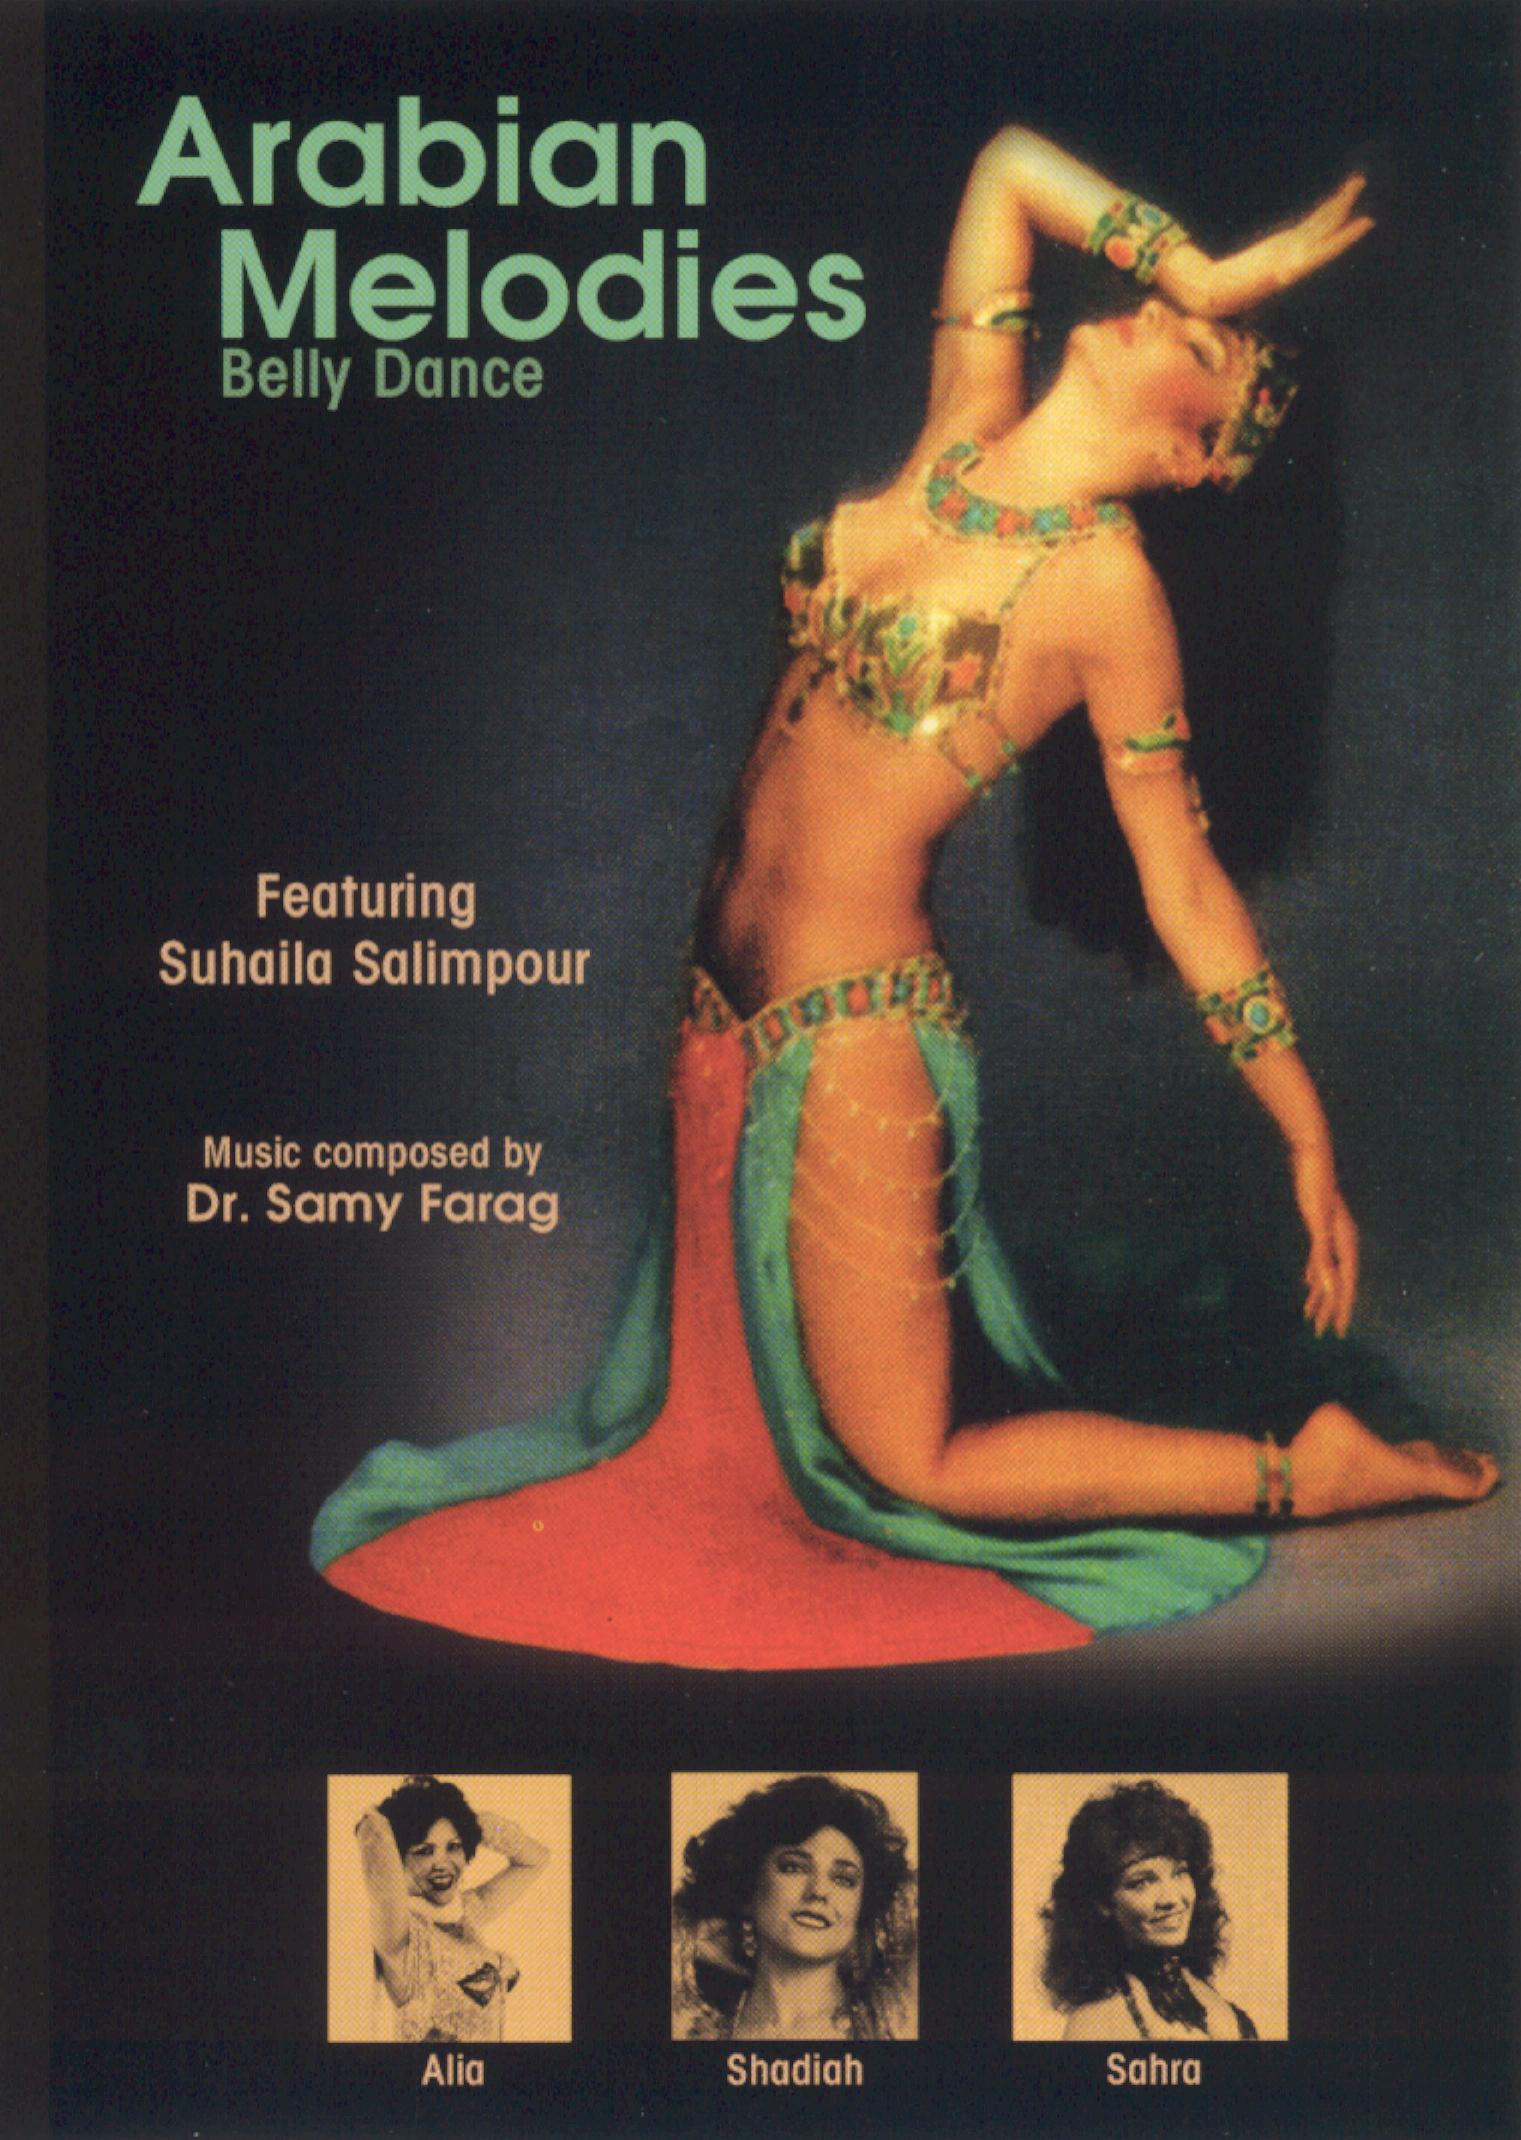 Arabian Melodies: Belly Dance